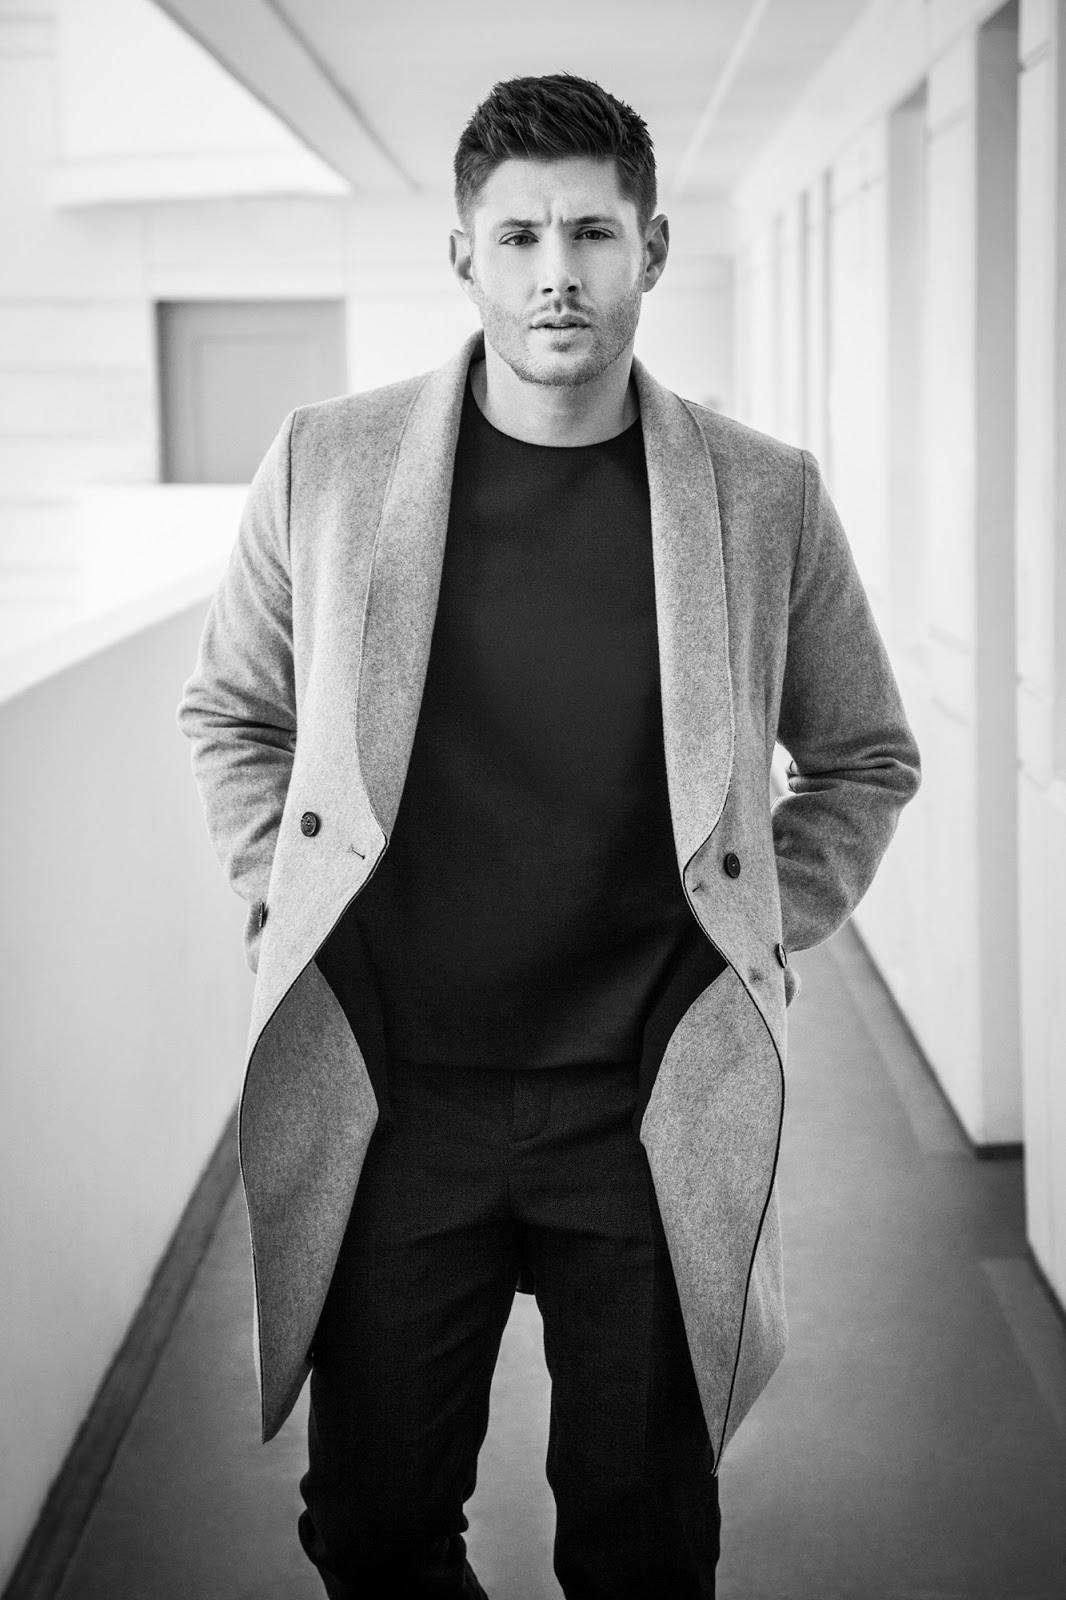 ДЖЕНСЕН ЭКЛЗ - Страница 6 Celeber-ru-Jensen-Ackles-Harper-s-Bazaar-CH-Magazine-Photoshoot-2014-08